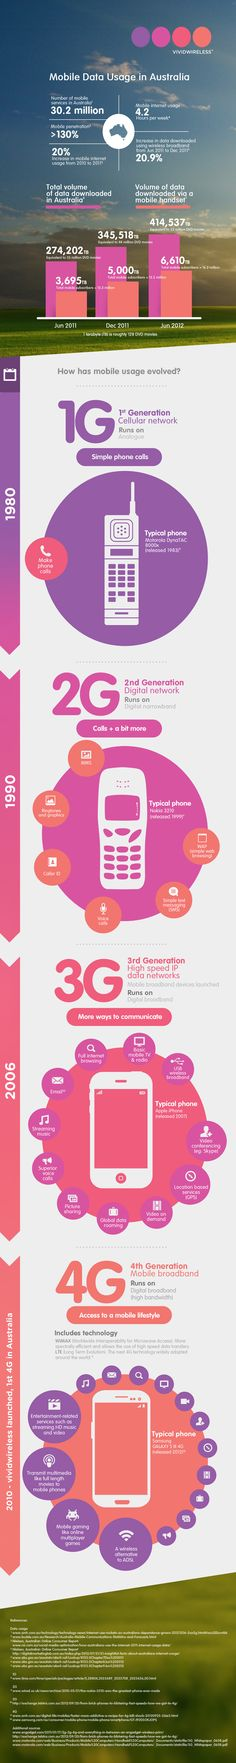 Mobile Data Usage in Australia Infographic | Vividwireless